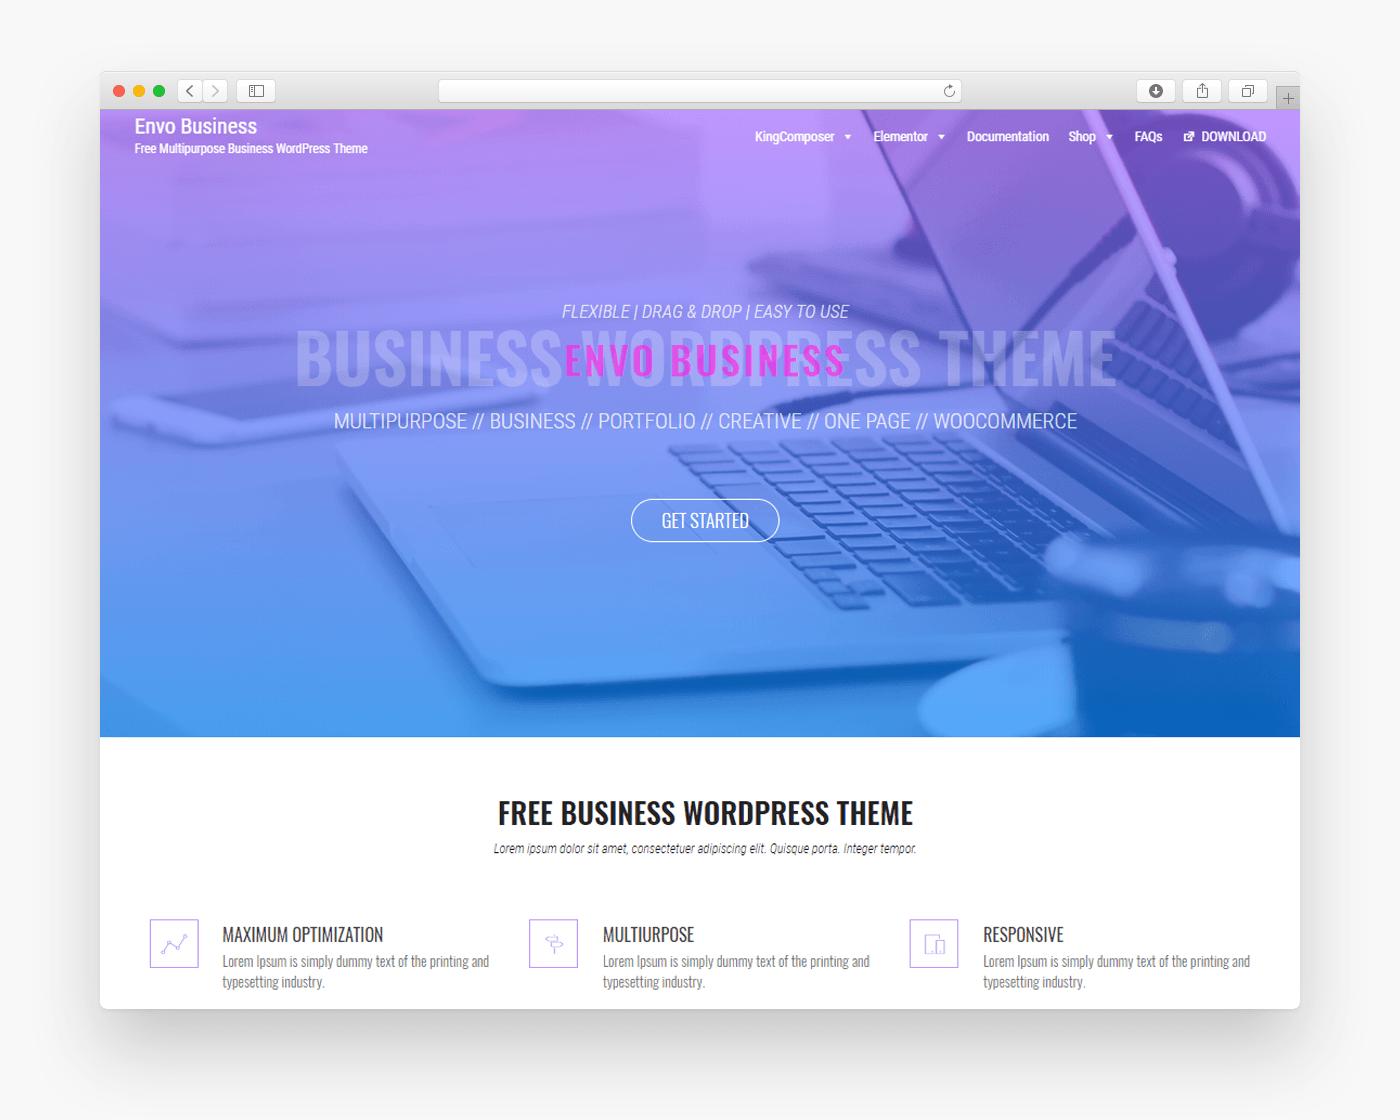 Envo Business - Free Ecommerce WordPress Theme - Freebie Supply